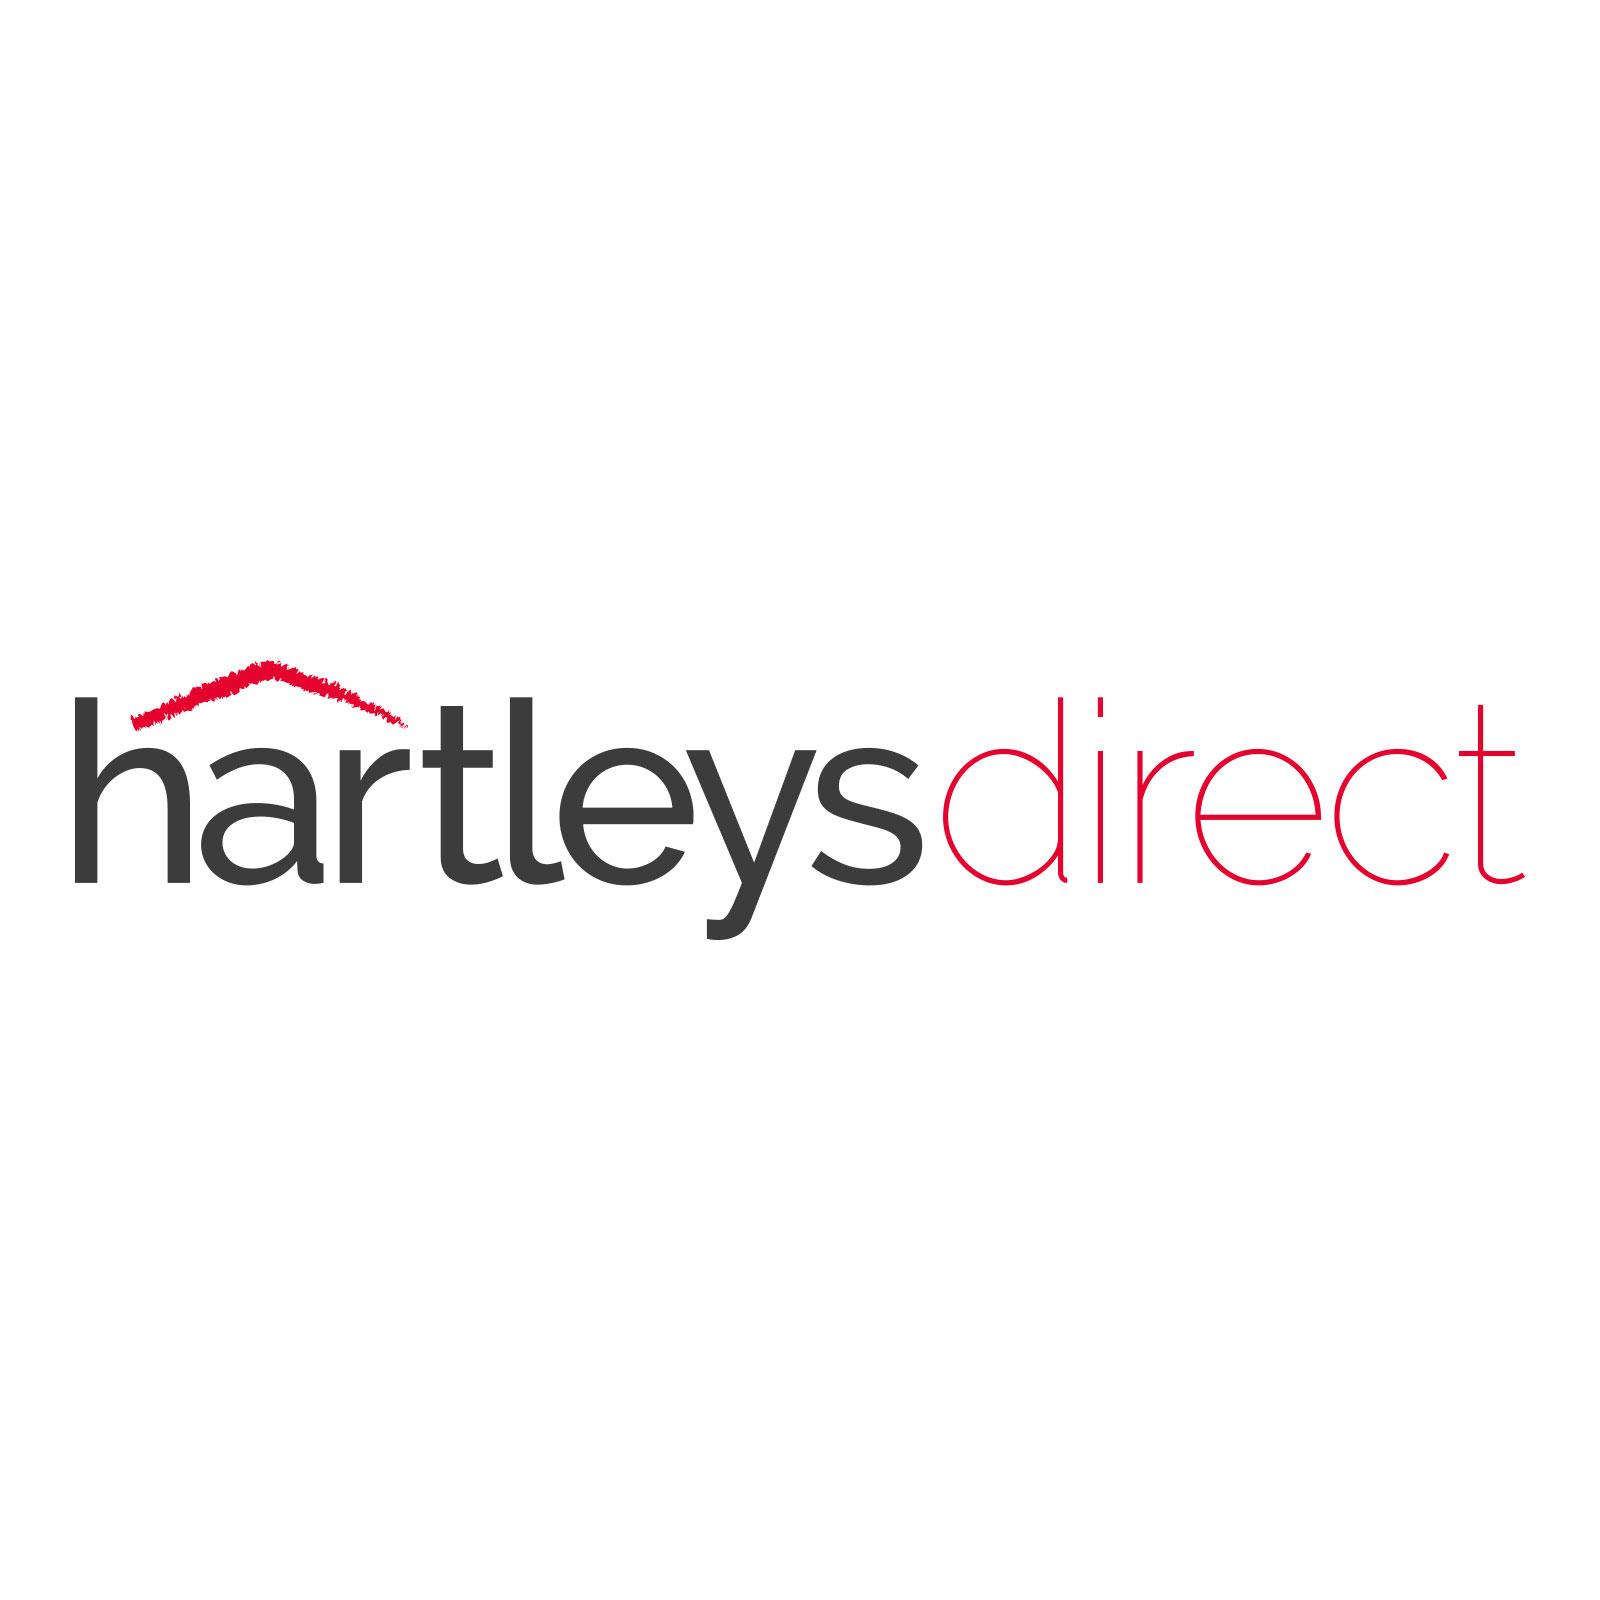 Hartleys-Grey-Retro-Desk-on-White-Background.jpg